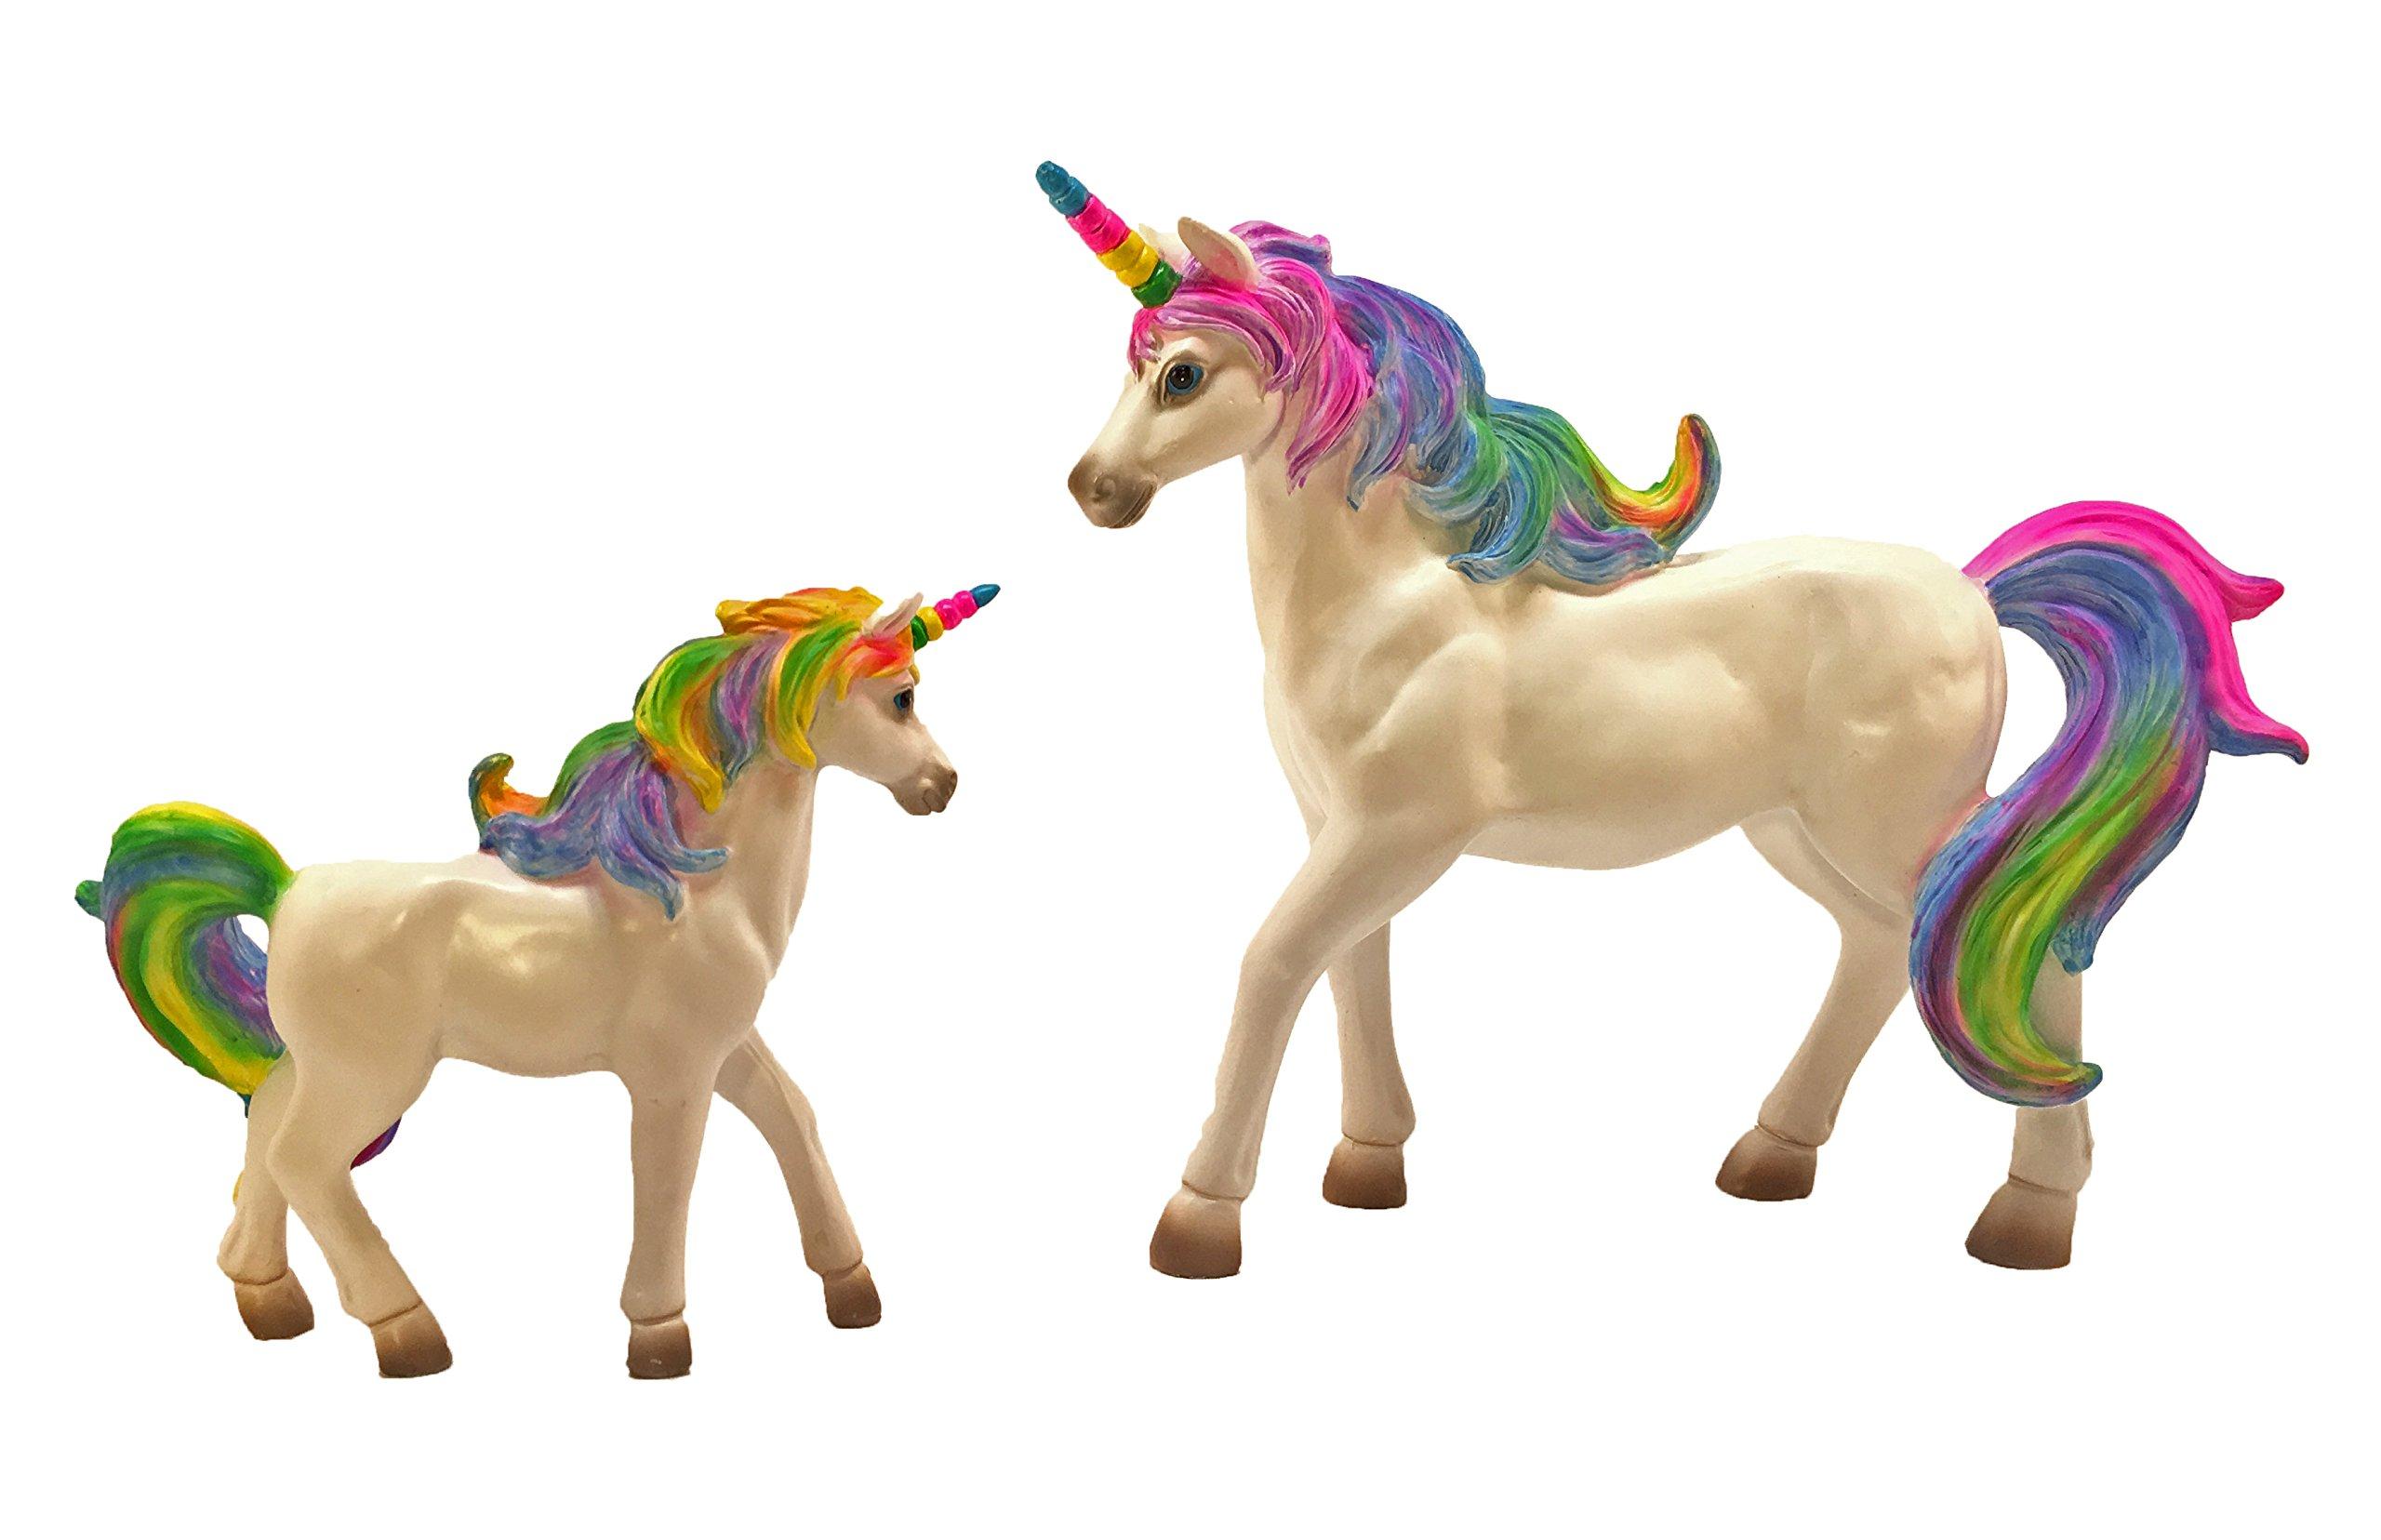 Rainbow Unicorn Set: Mother Unicorn (Alana) and Daughter Unicorn (Penelope) Miniatures Unicorn Figurines for your fairy garden by GlitZGlam by GlitZGlam (Image #4)